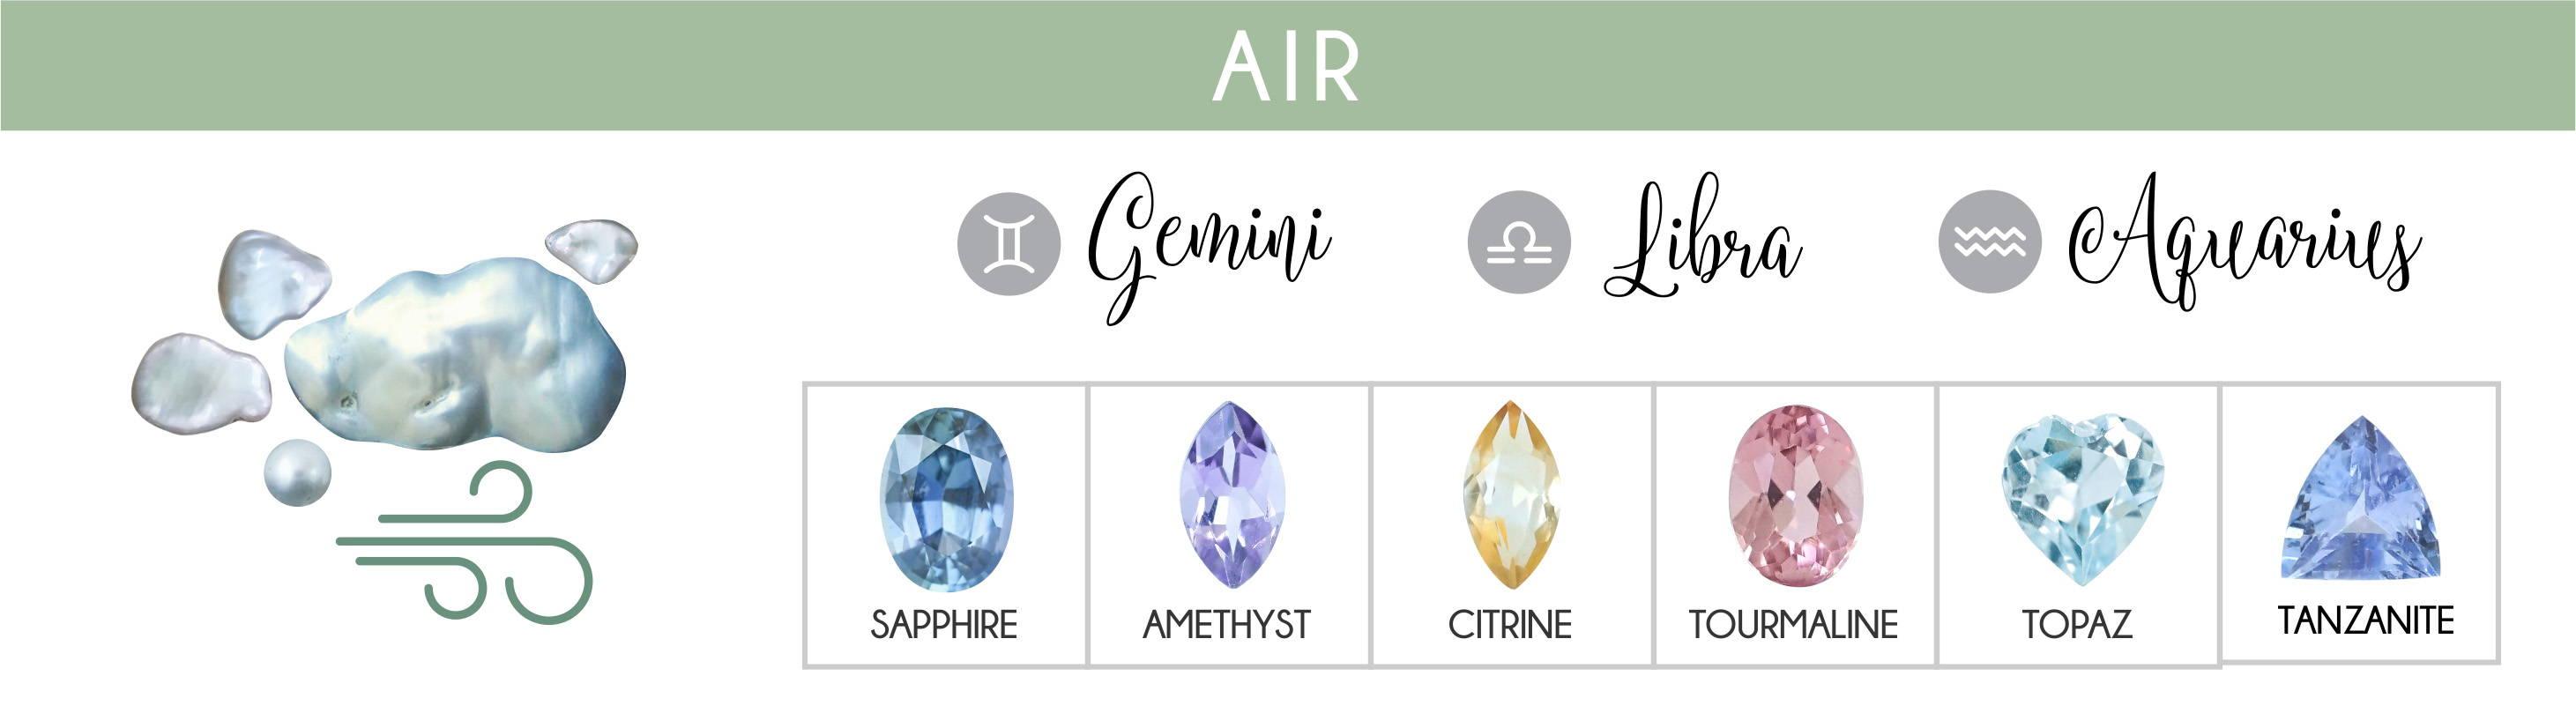 Air element zodiacs: Gemini, Libra, and Aquarius